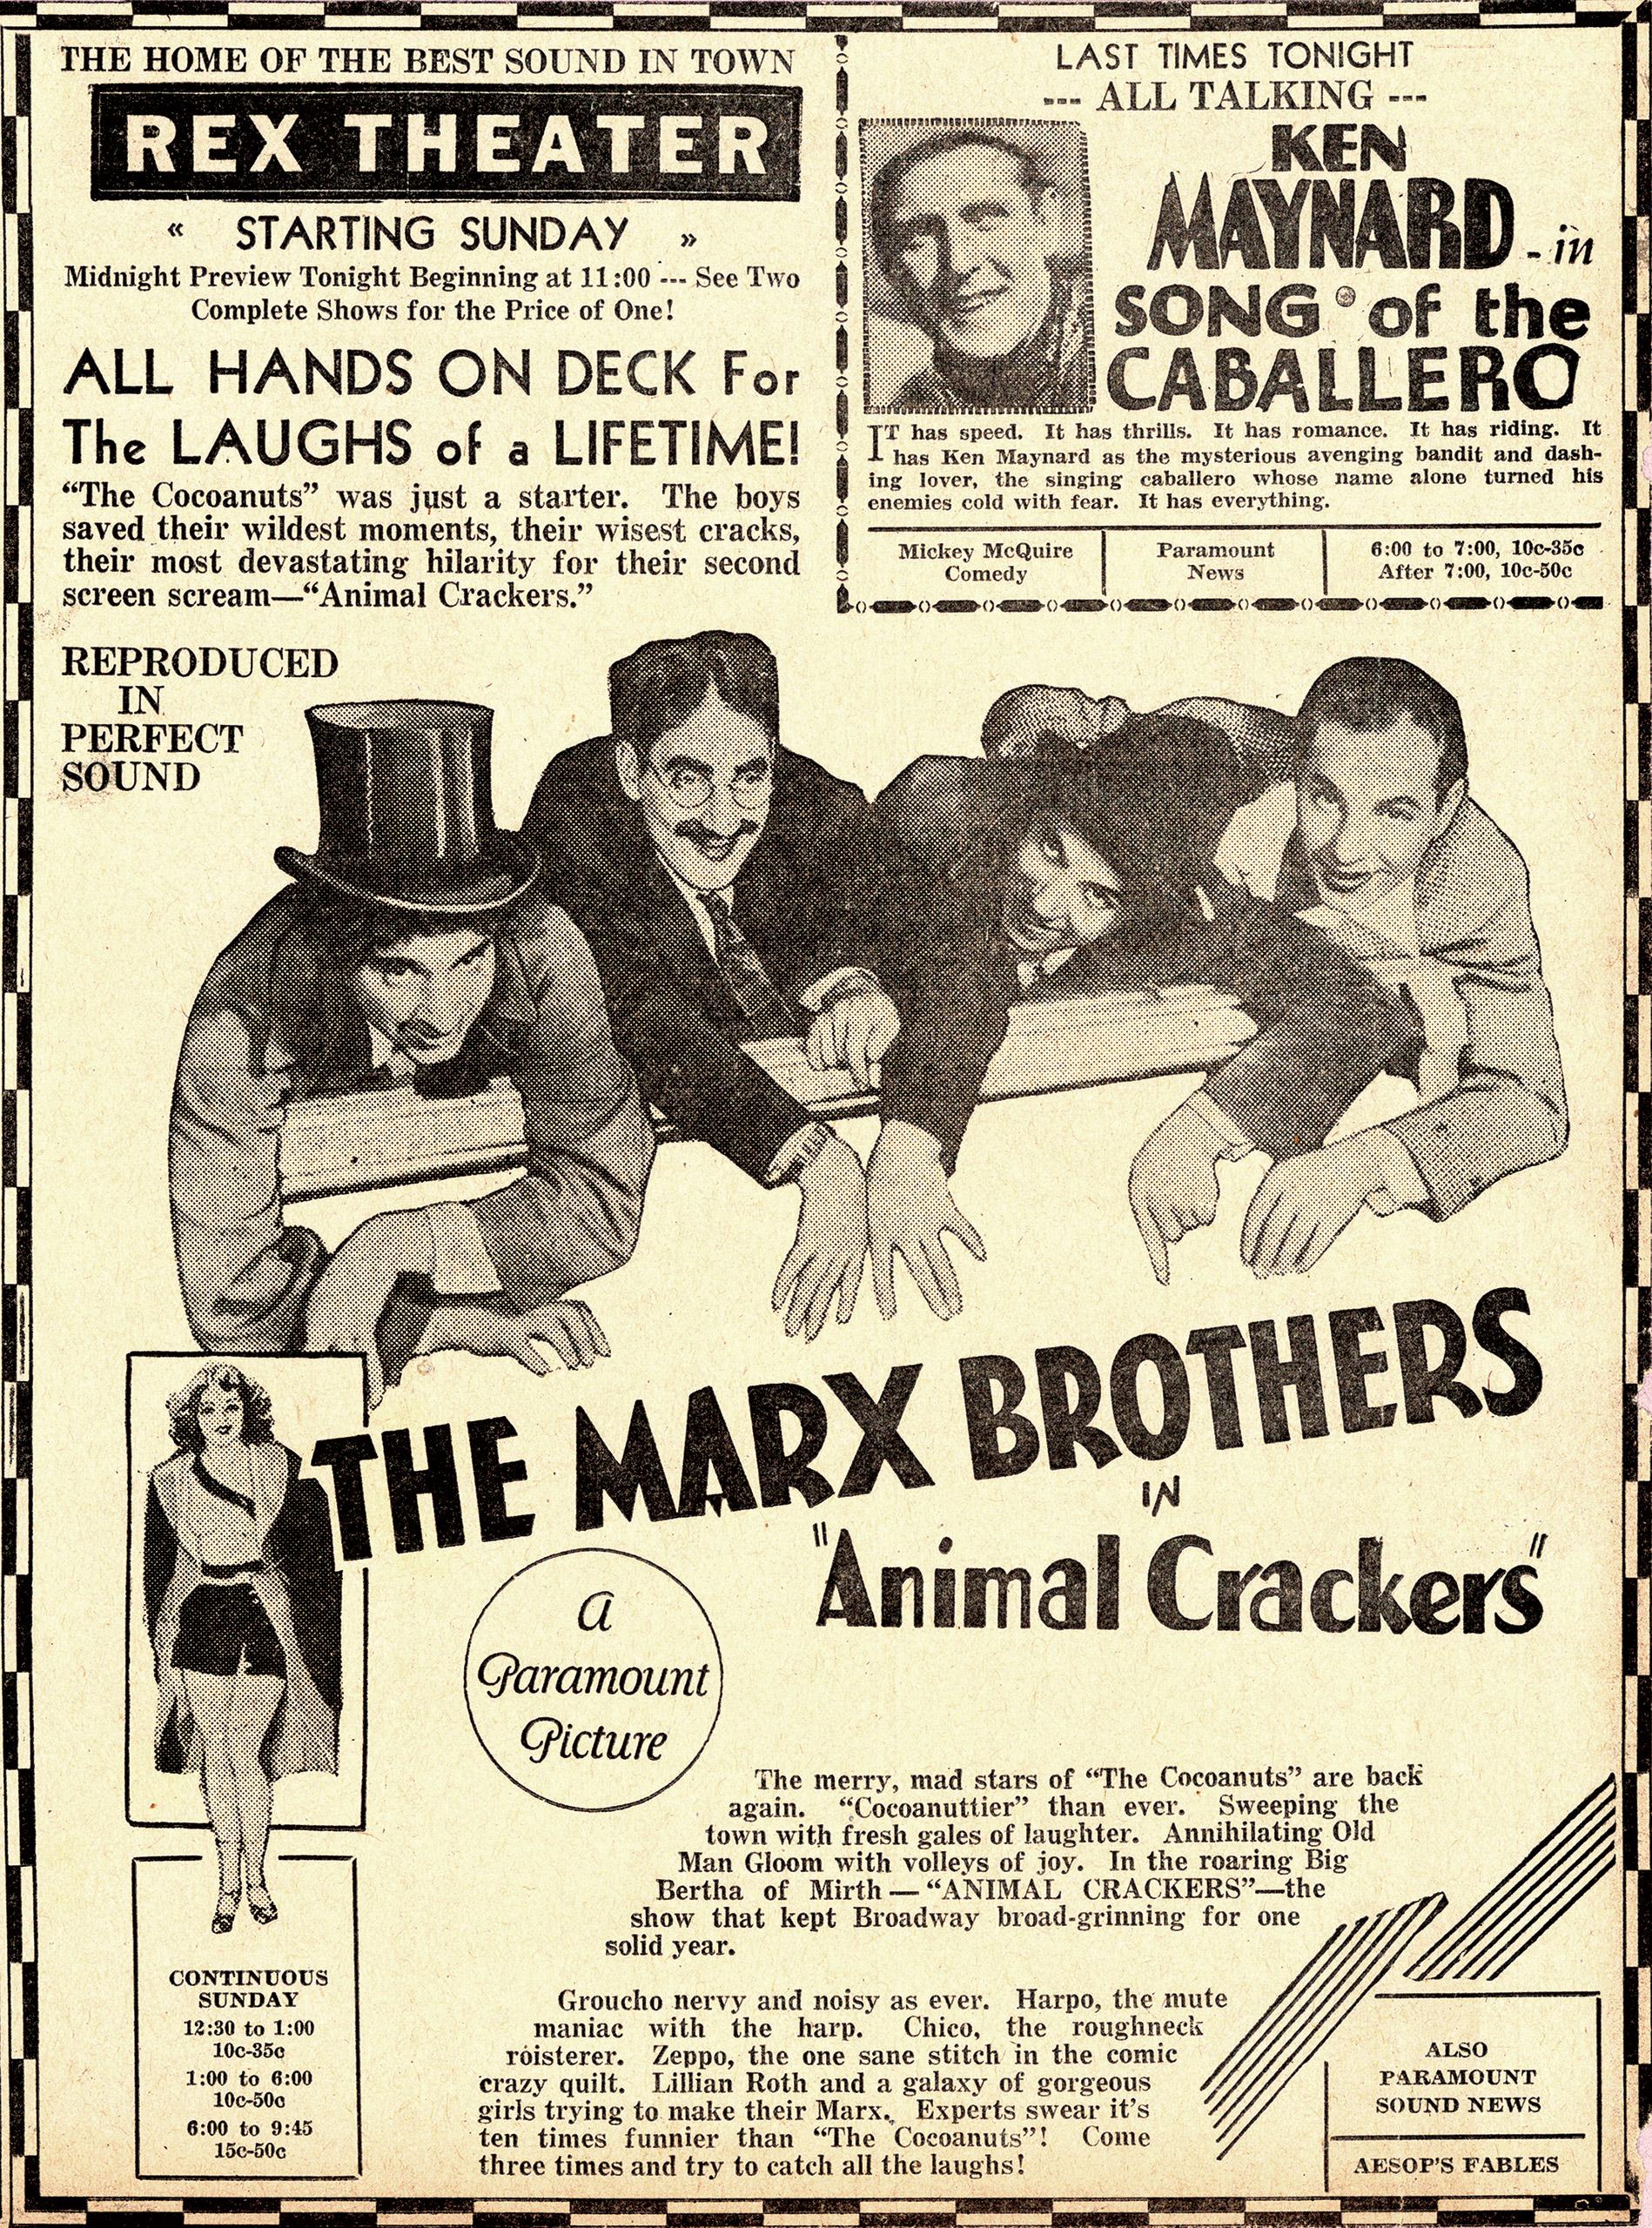 Animal Crackers newspaper advertisement, 1930.